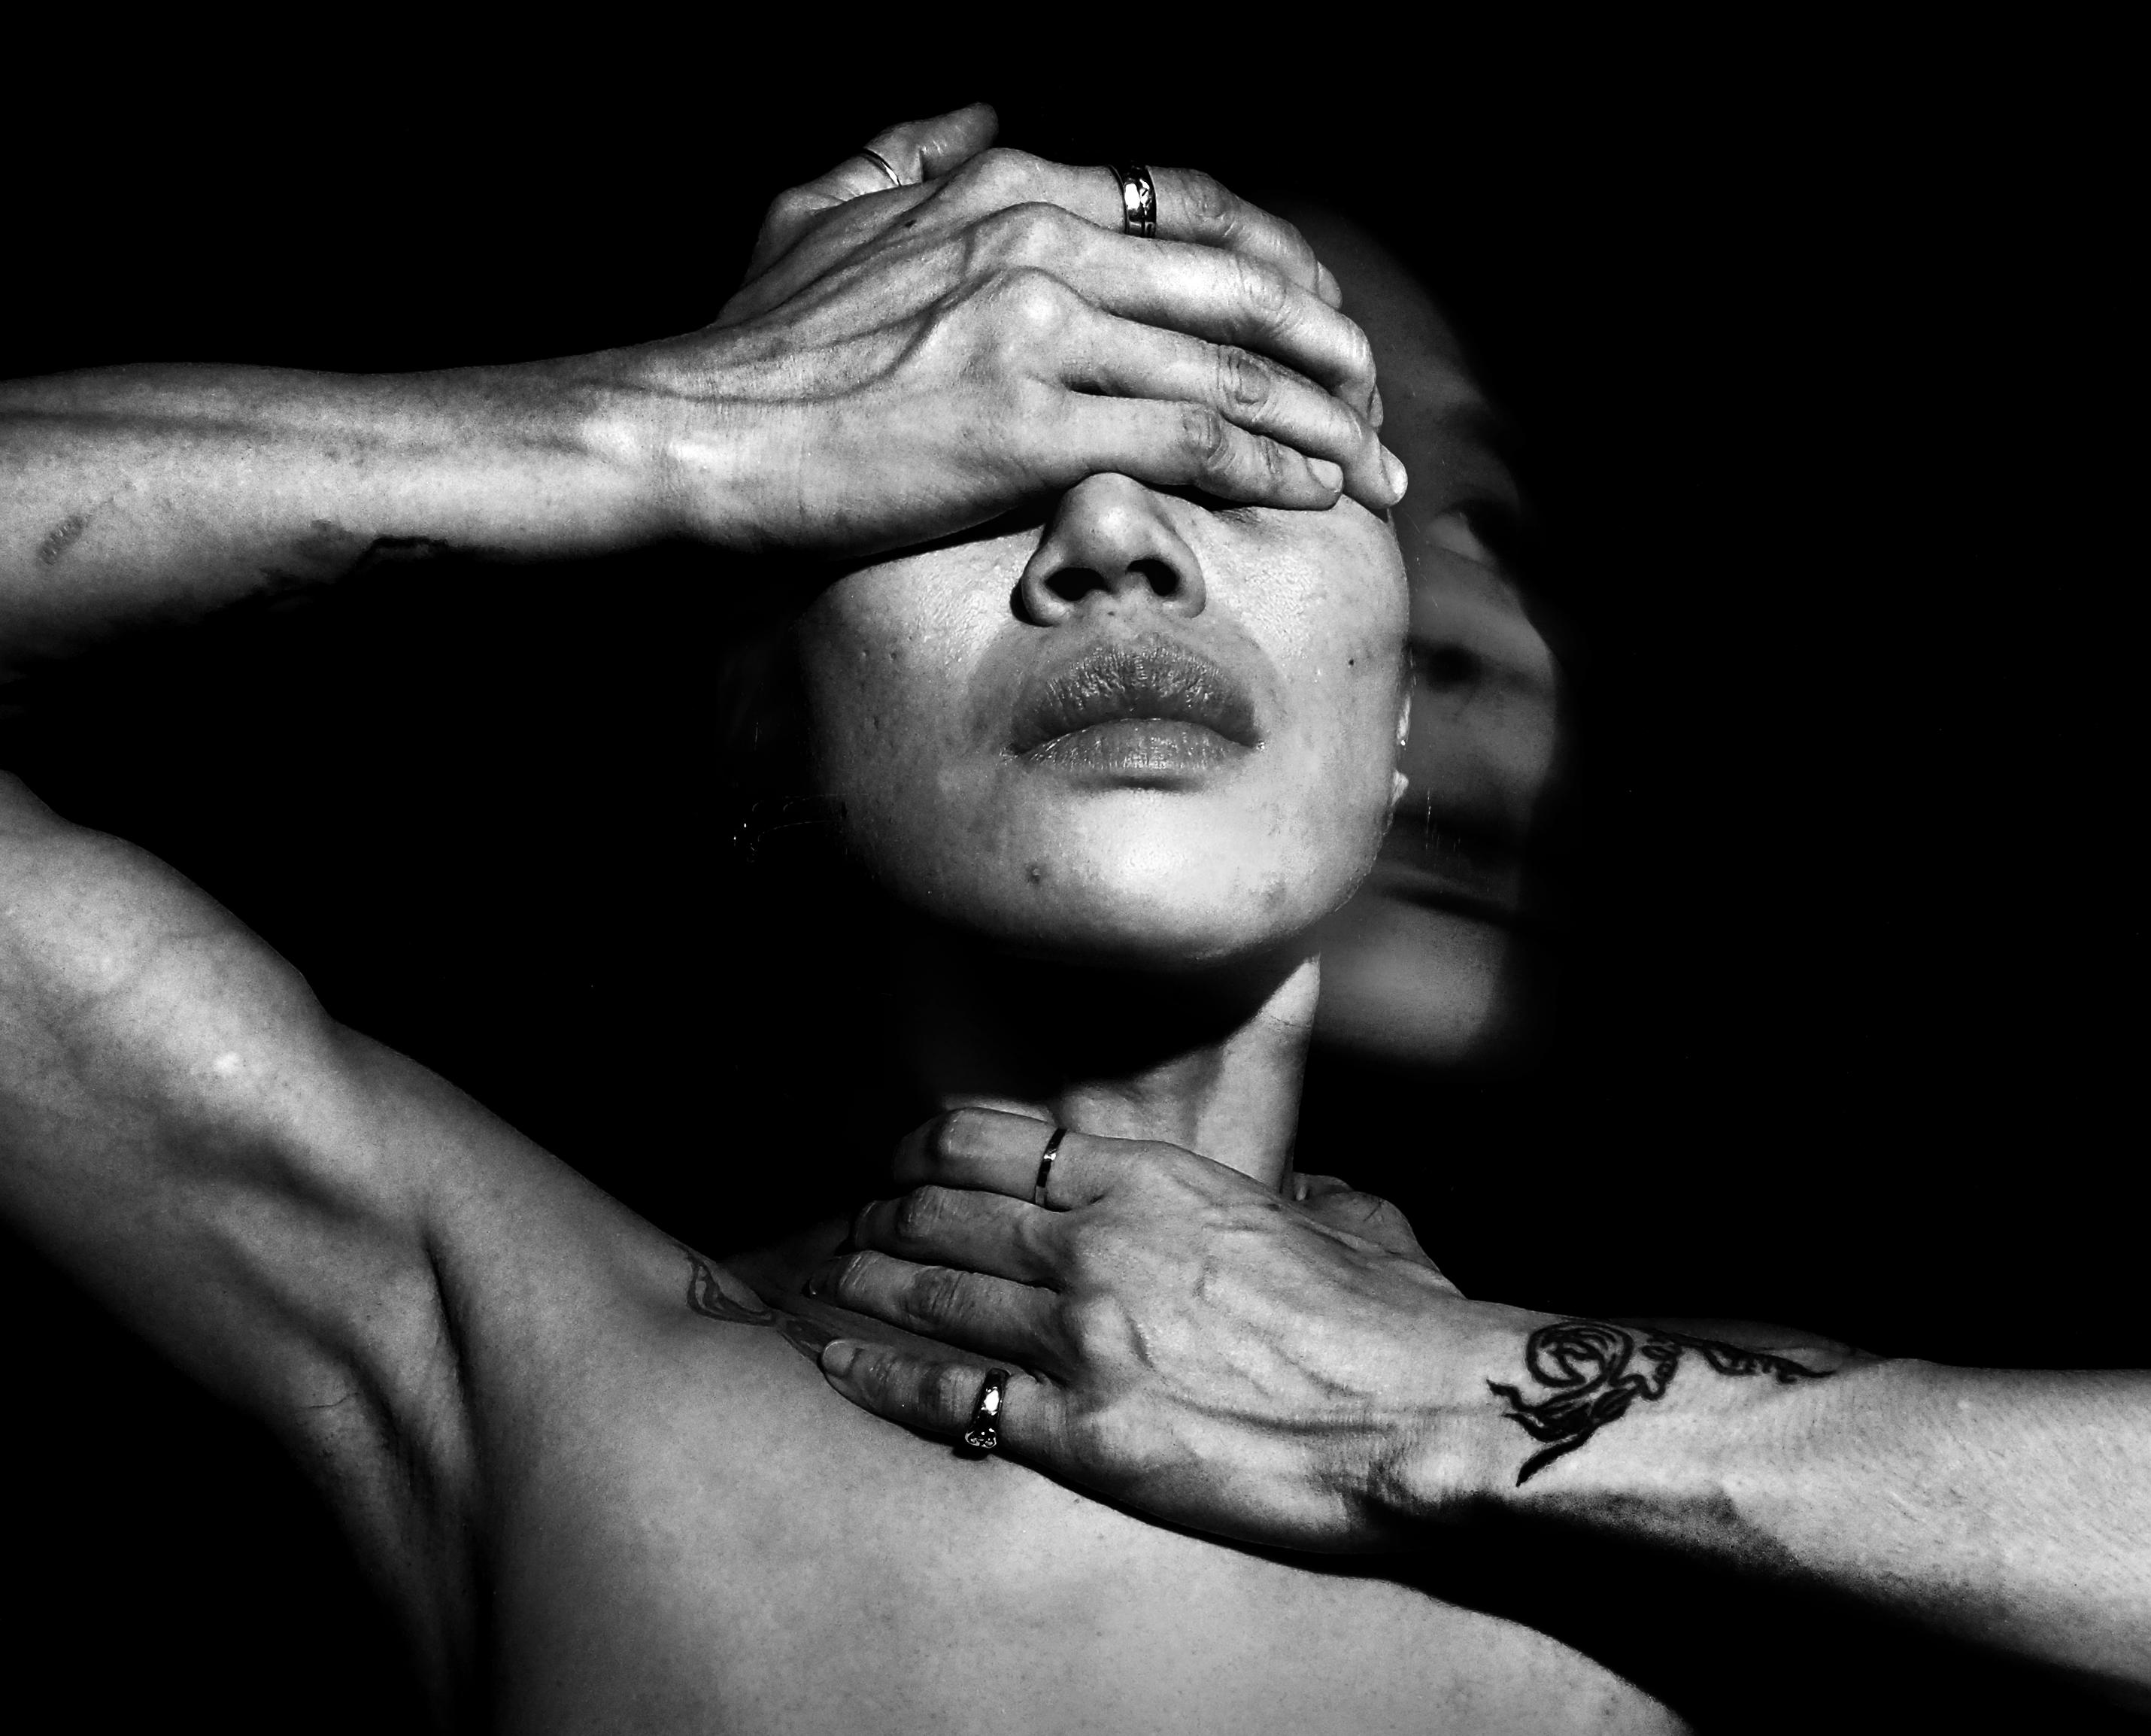 uncontrolled brain frequency suelynee ho 何書伶 Artwork photographer nude art